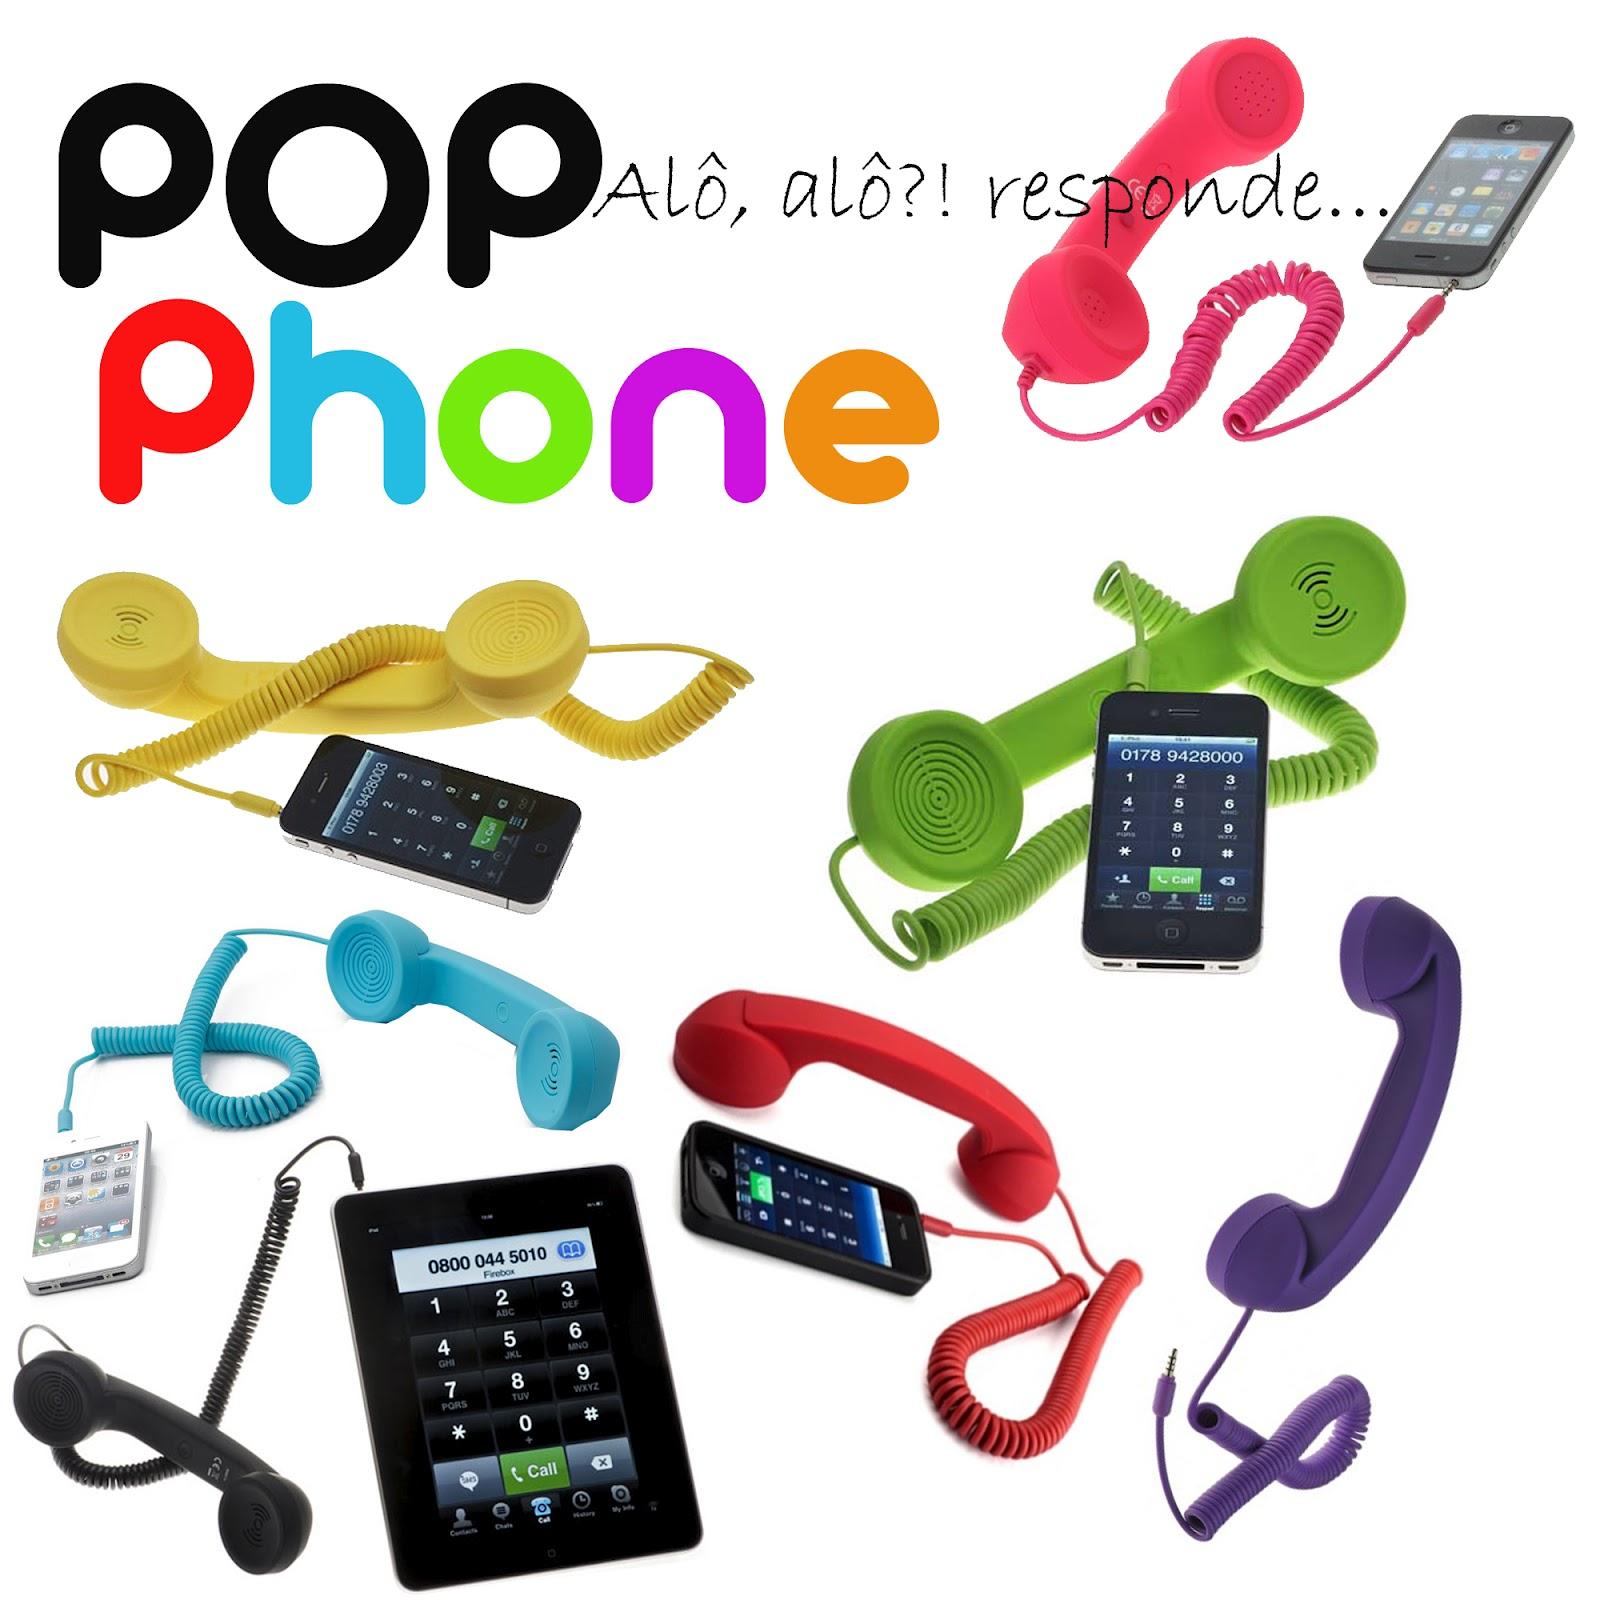 http://1.bp.blogspot.com/-DbLUrPaivaE/T2s_qbuN8ZI/AAAAAAAABLU/DULBW2NXLSw/s1600/pop+phone.jpg